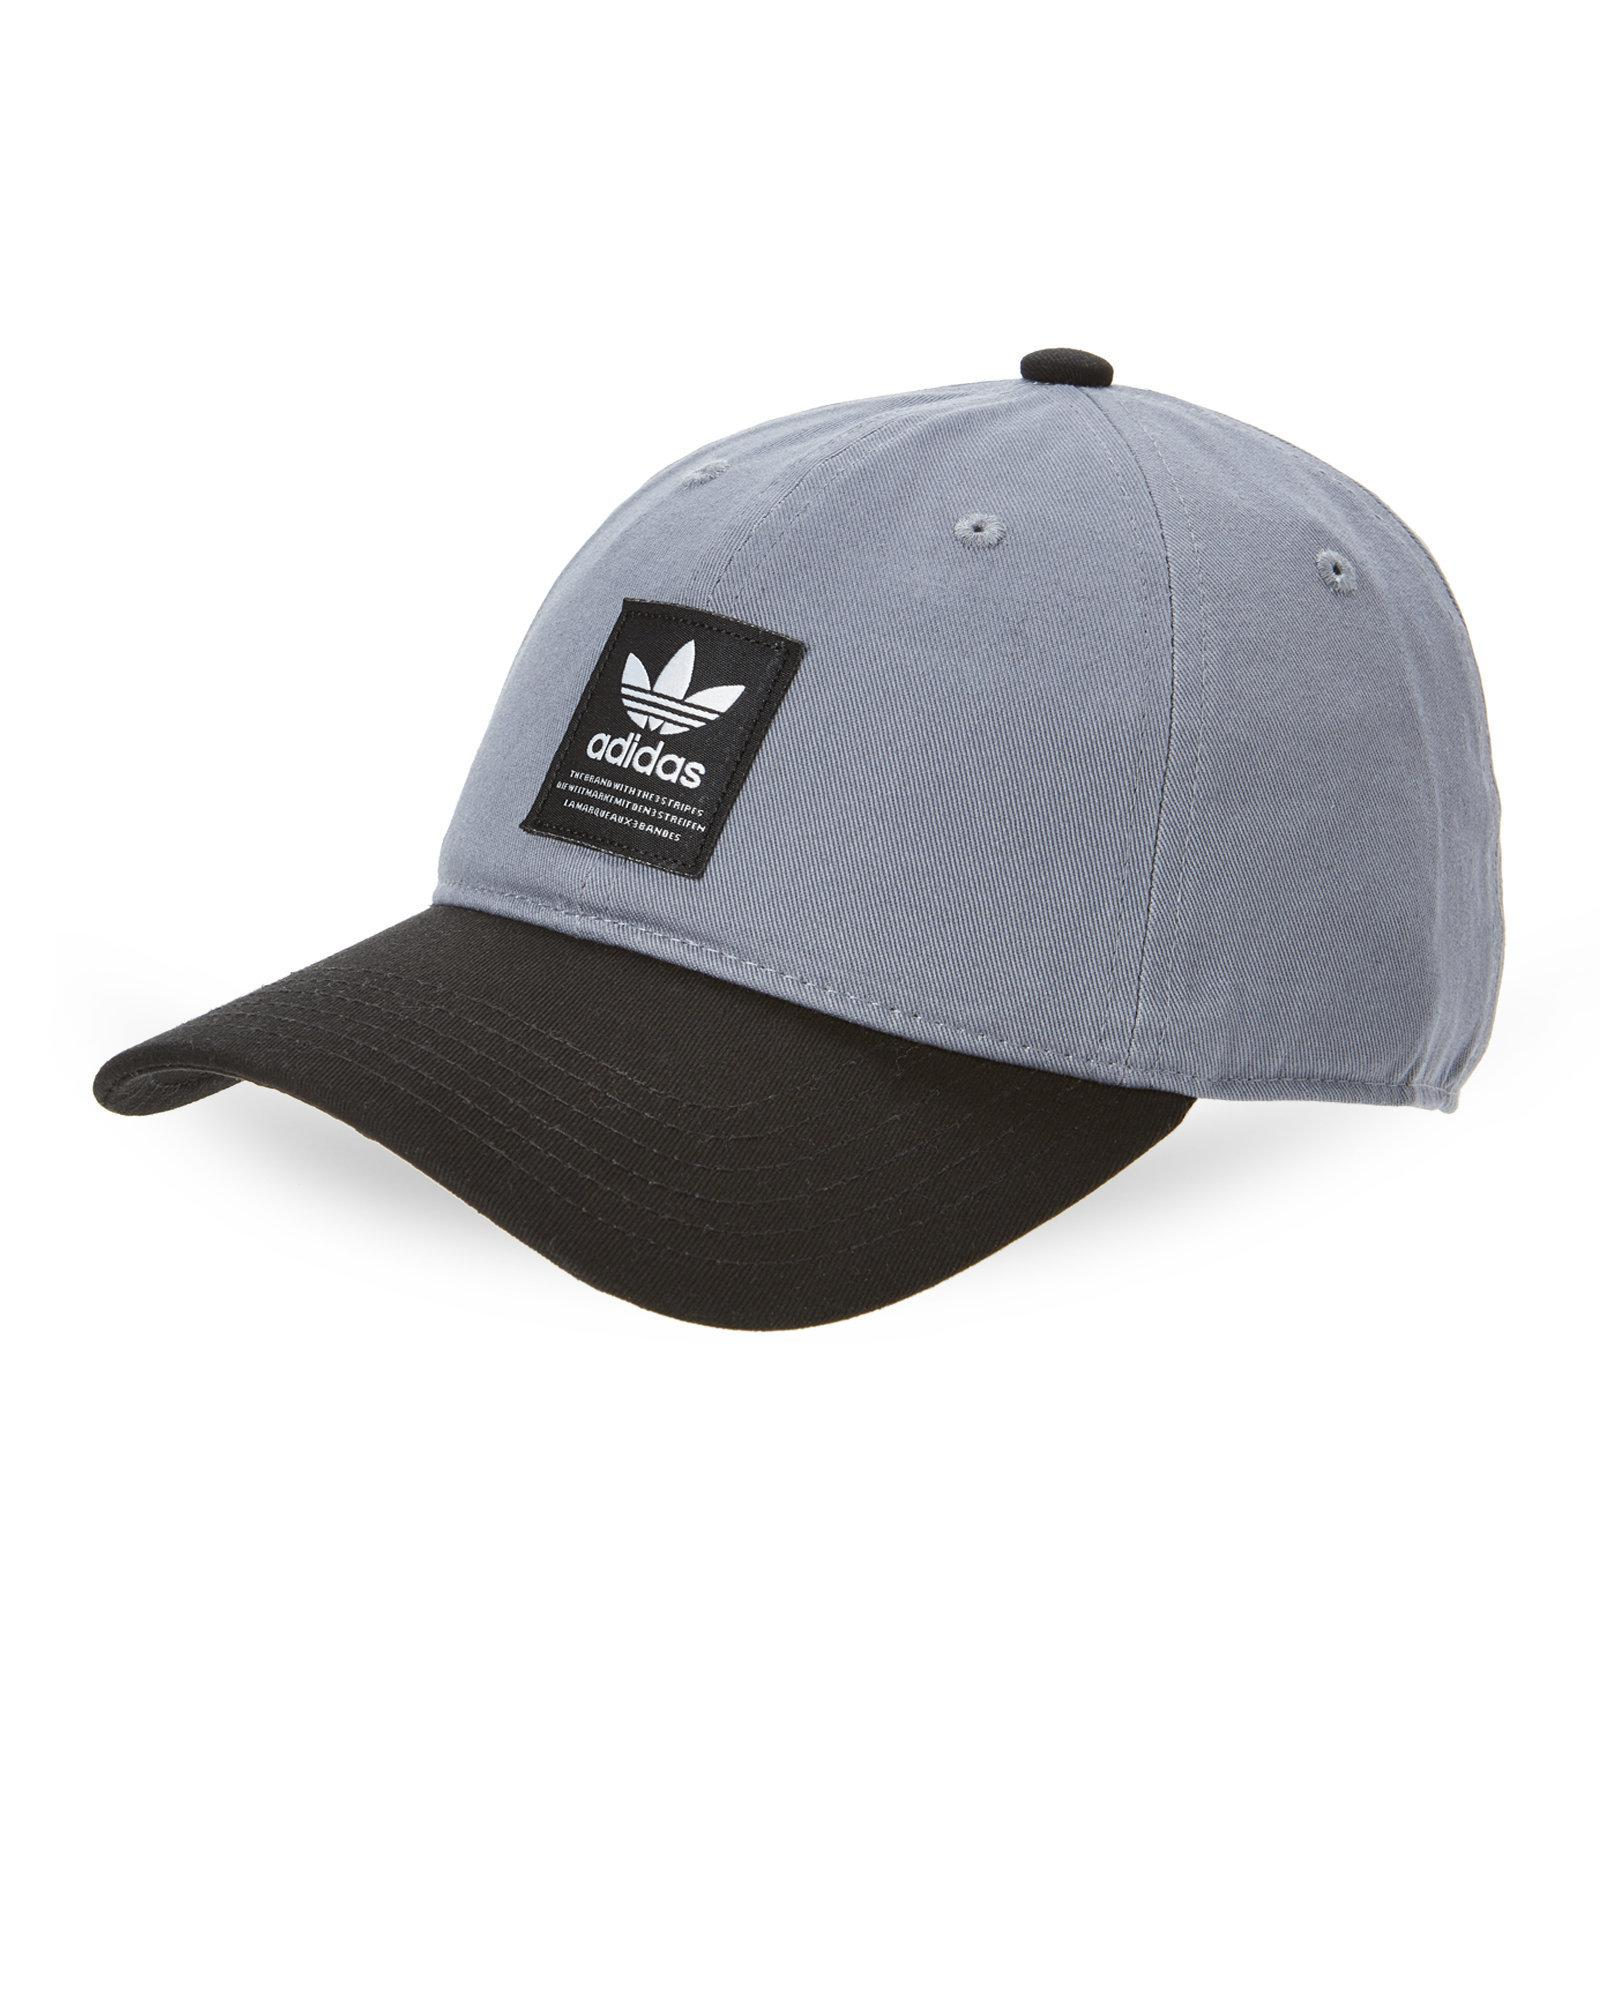 ec436337b31 Lyst - Adidas Grey   Black Baseball Cap in Gray for Men